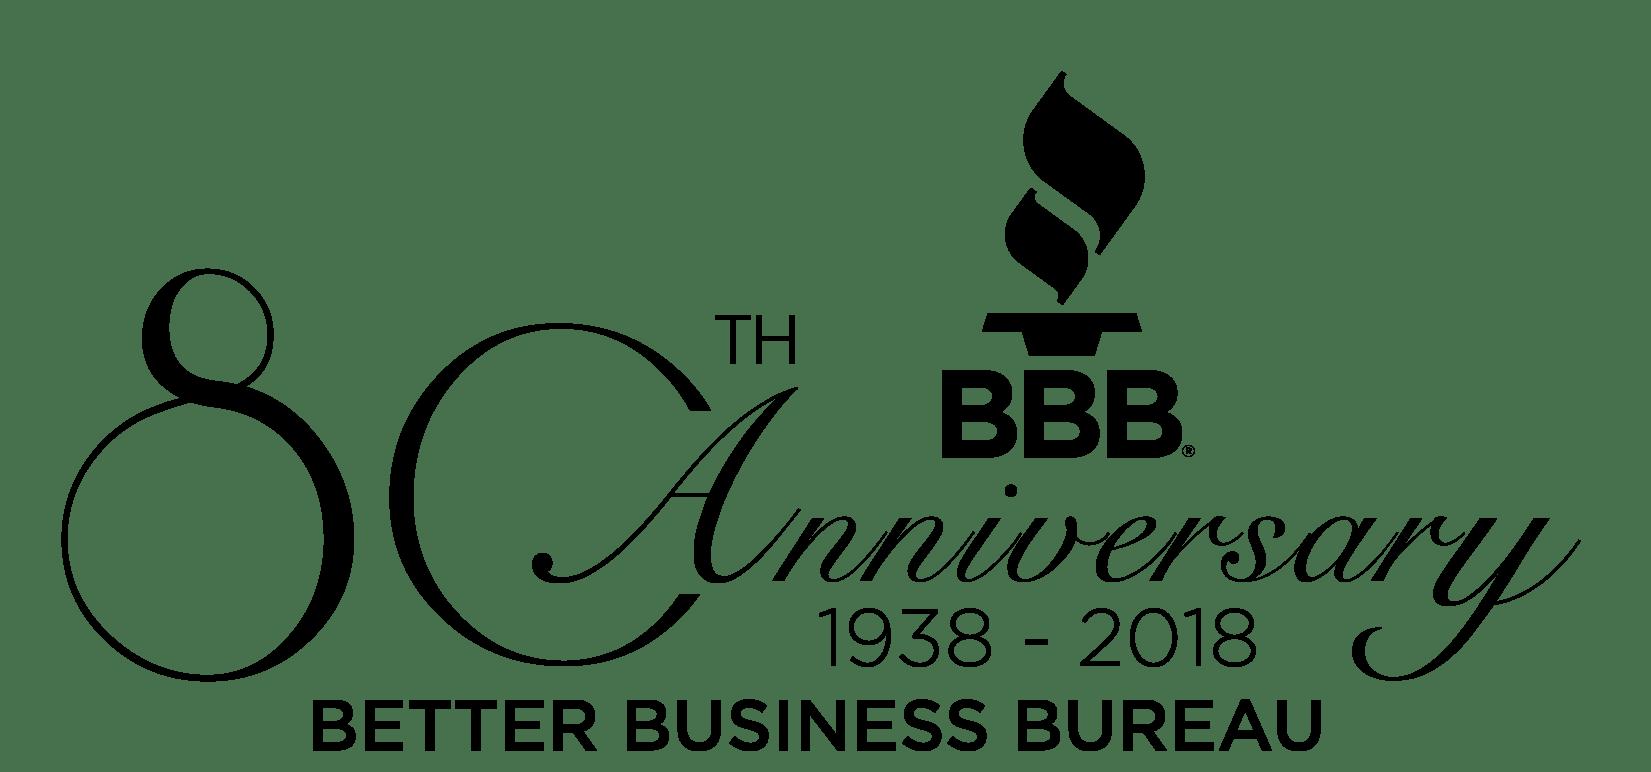 BBB 80th Anniversary Celebration + Open House